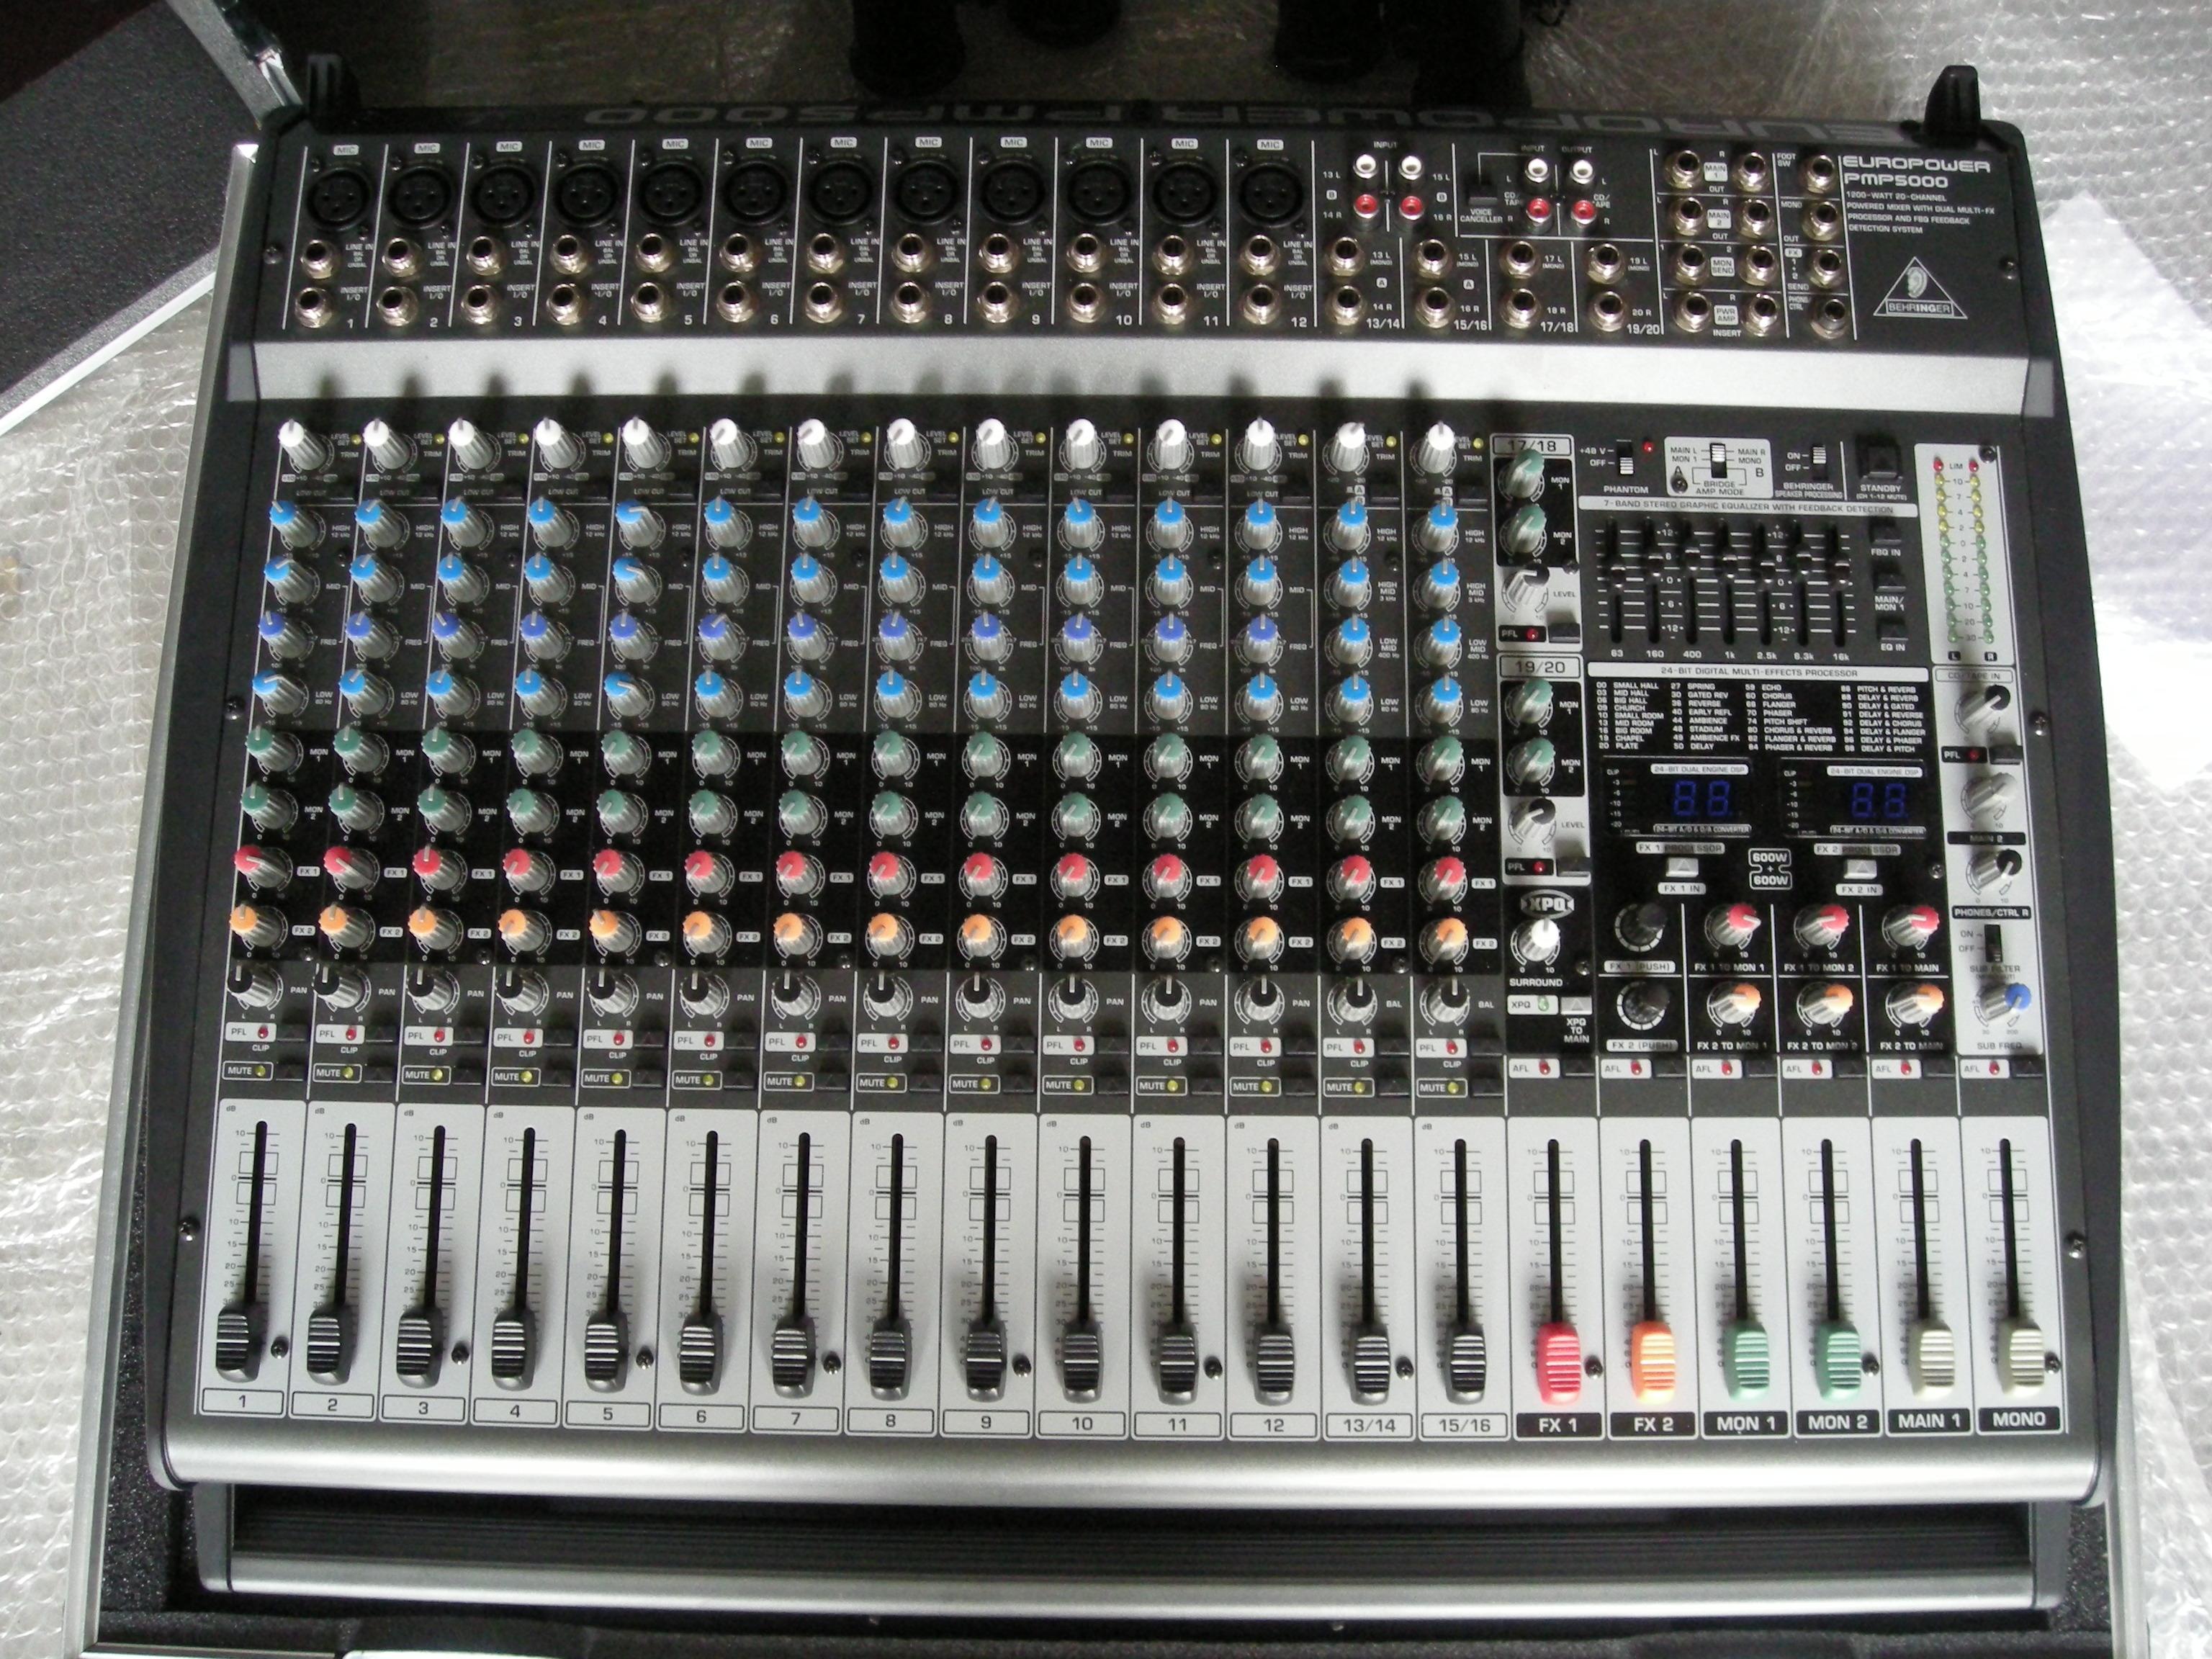 Behringer Europower Pmp5000 Image 786003 Audiofanzine